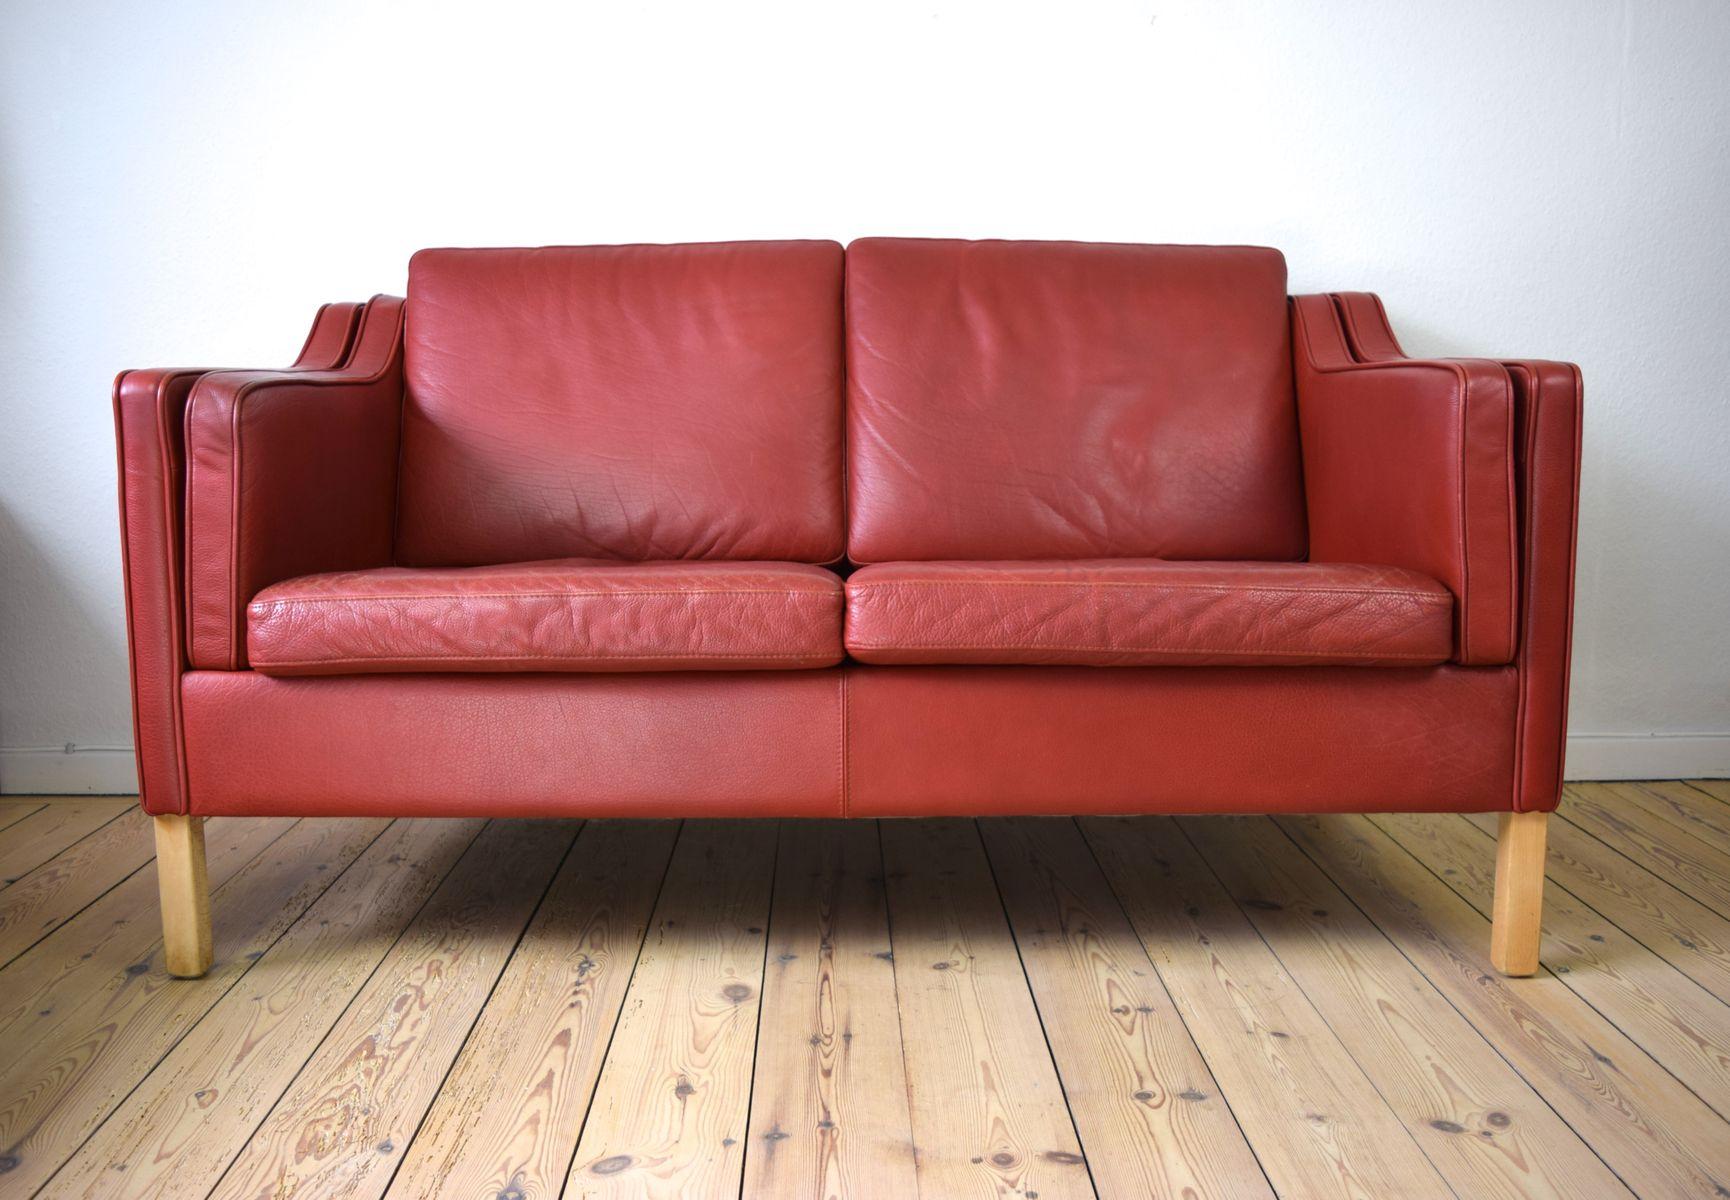 canap vintage en cuir rouge danemark en vente sur pamono. Black Bedroom Furniture Sets. Home Design Ideas